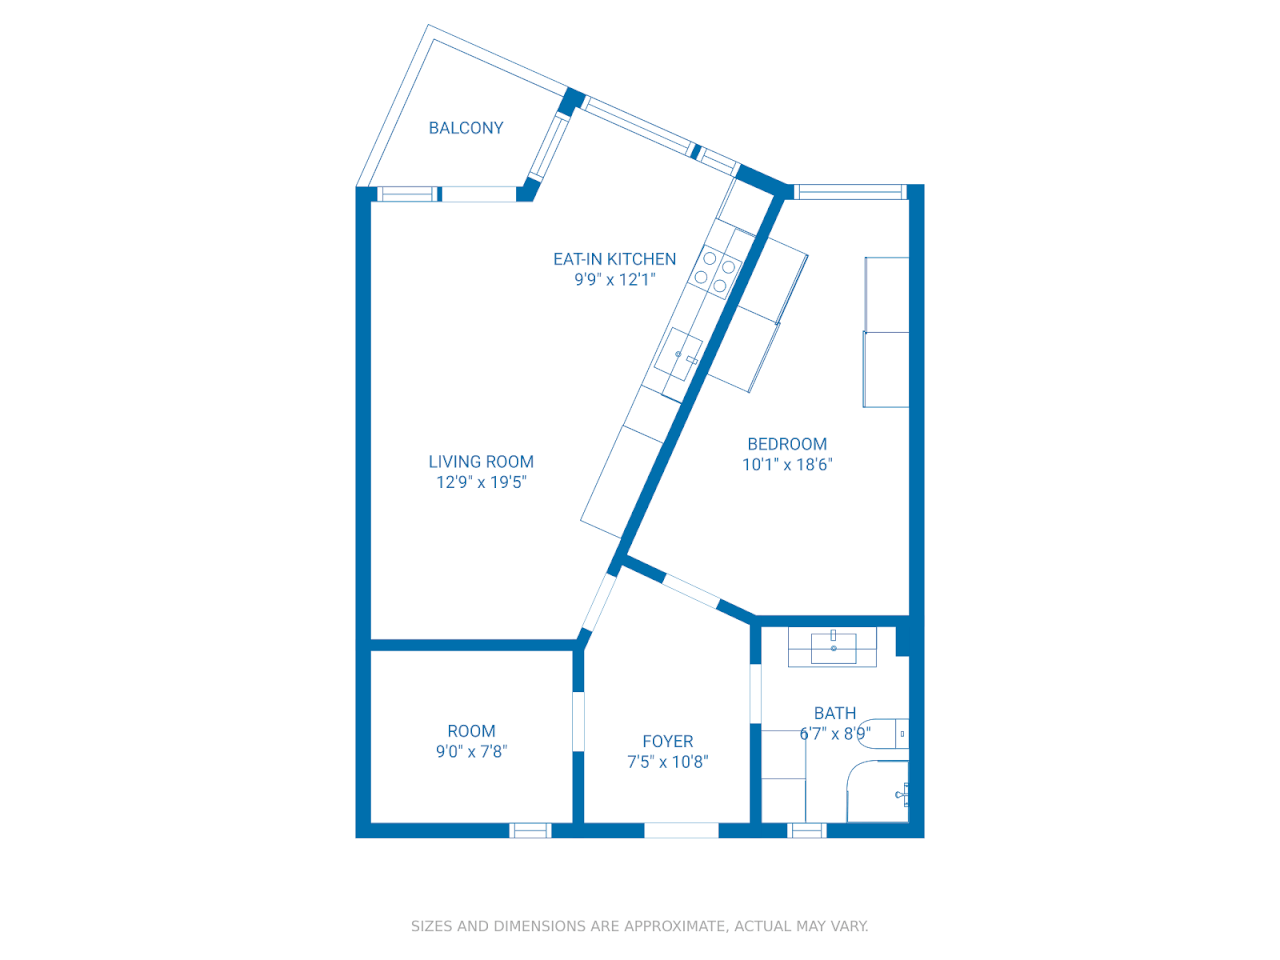 Floor plan theme: Blueprint